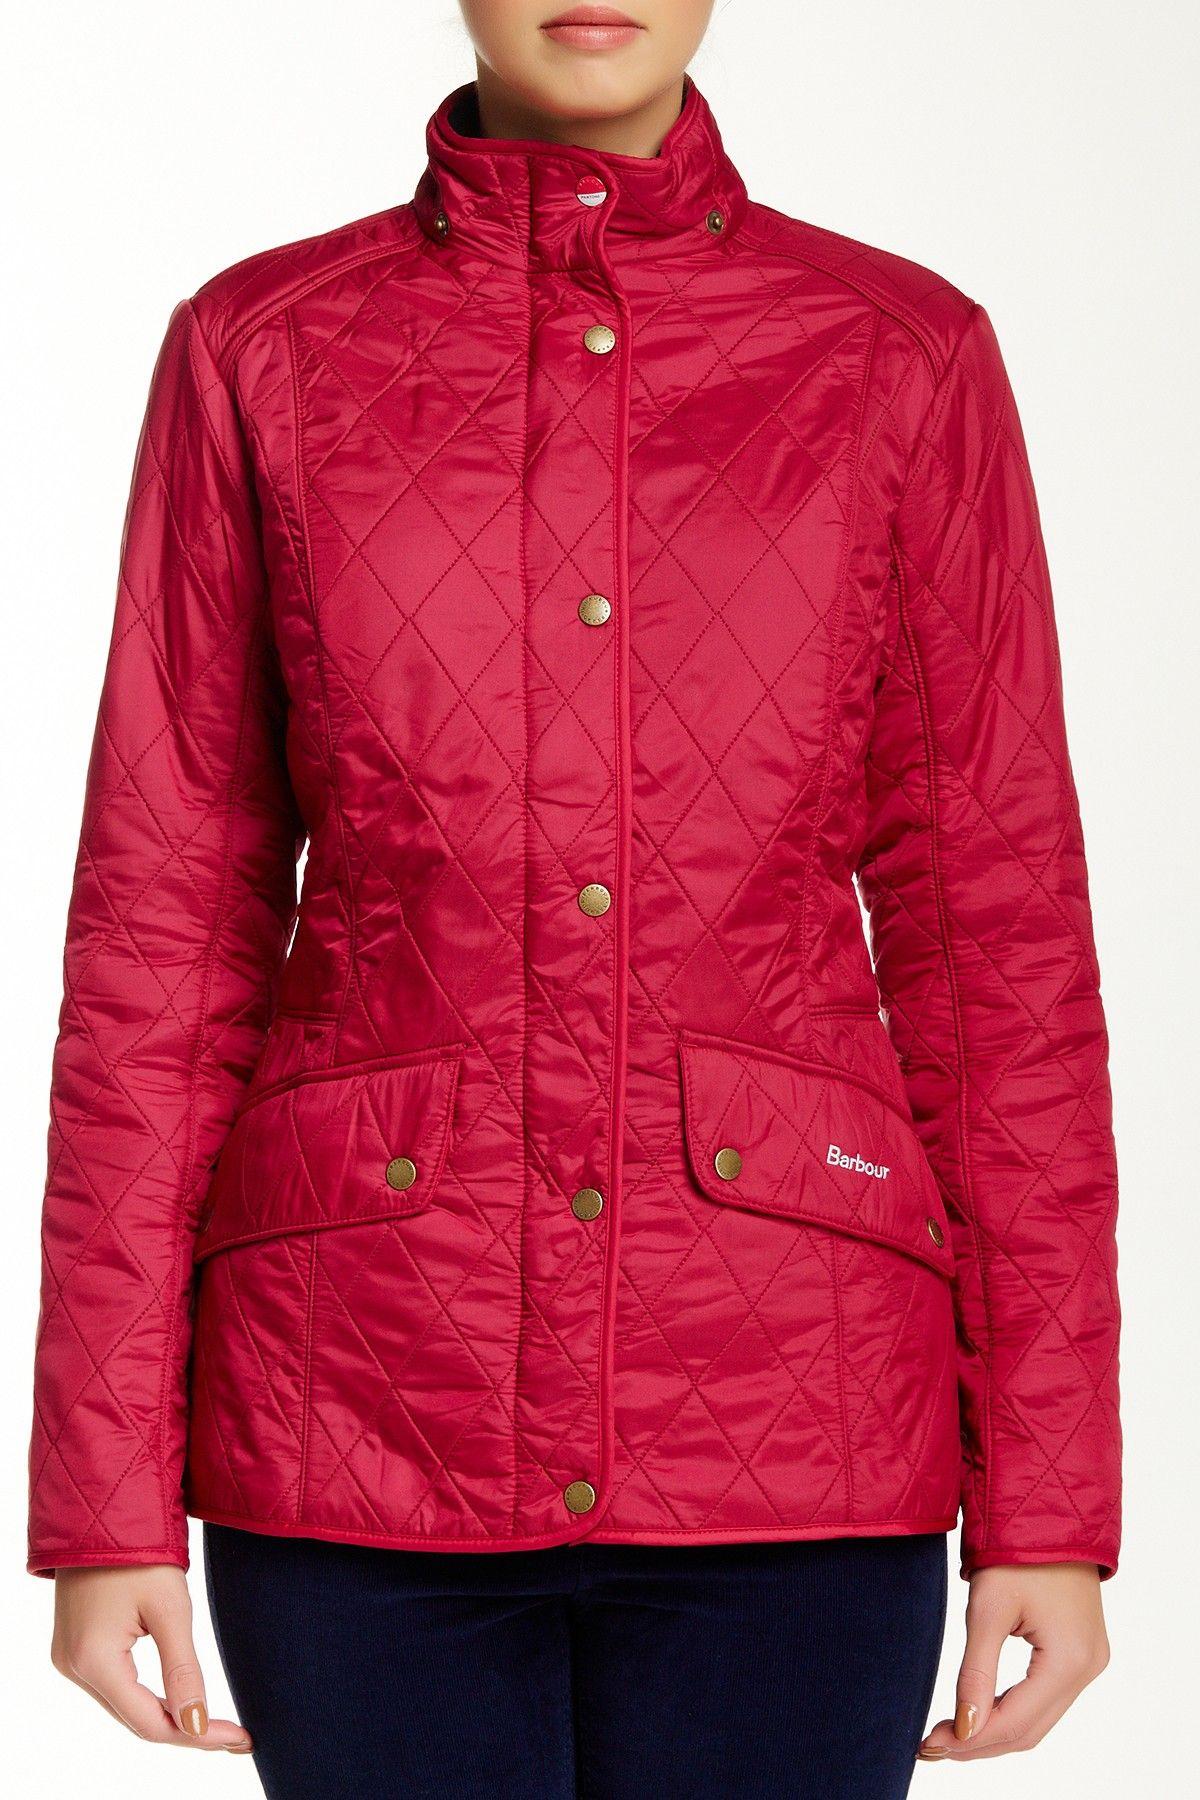 Barbour | Chromatic Quilts Jacket |